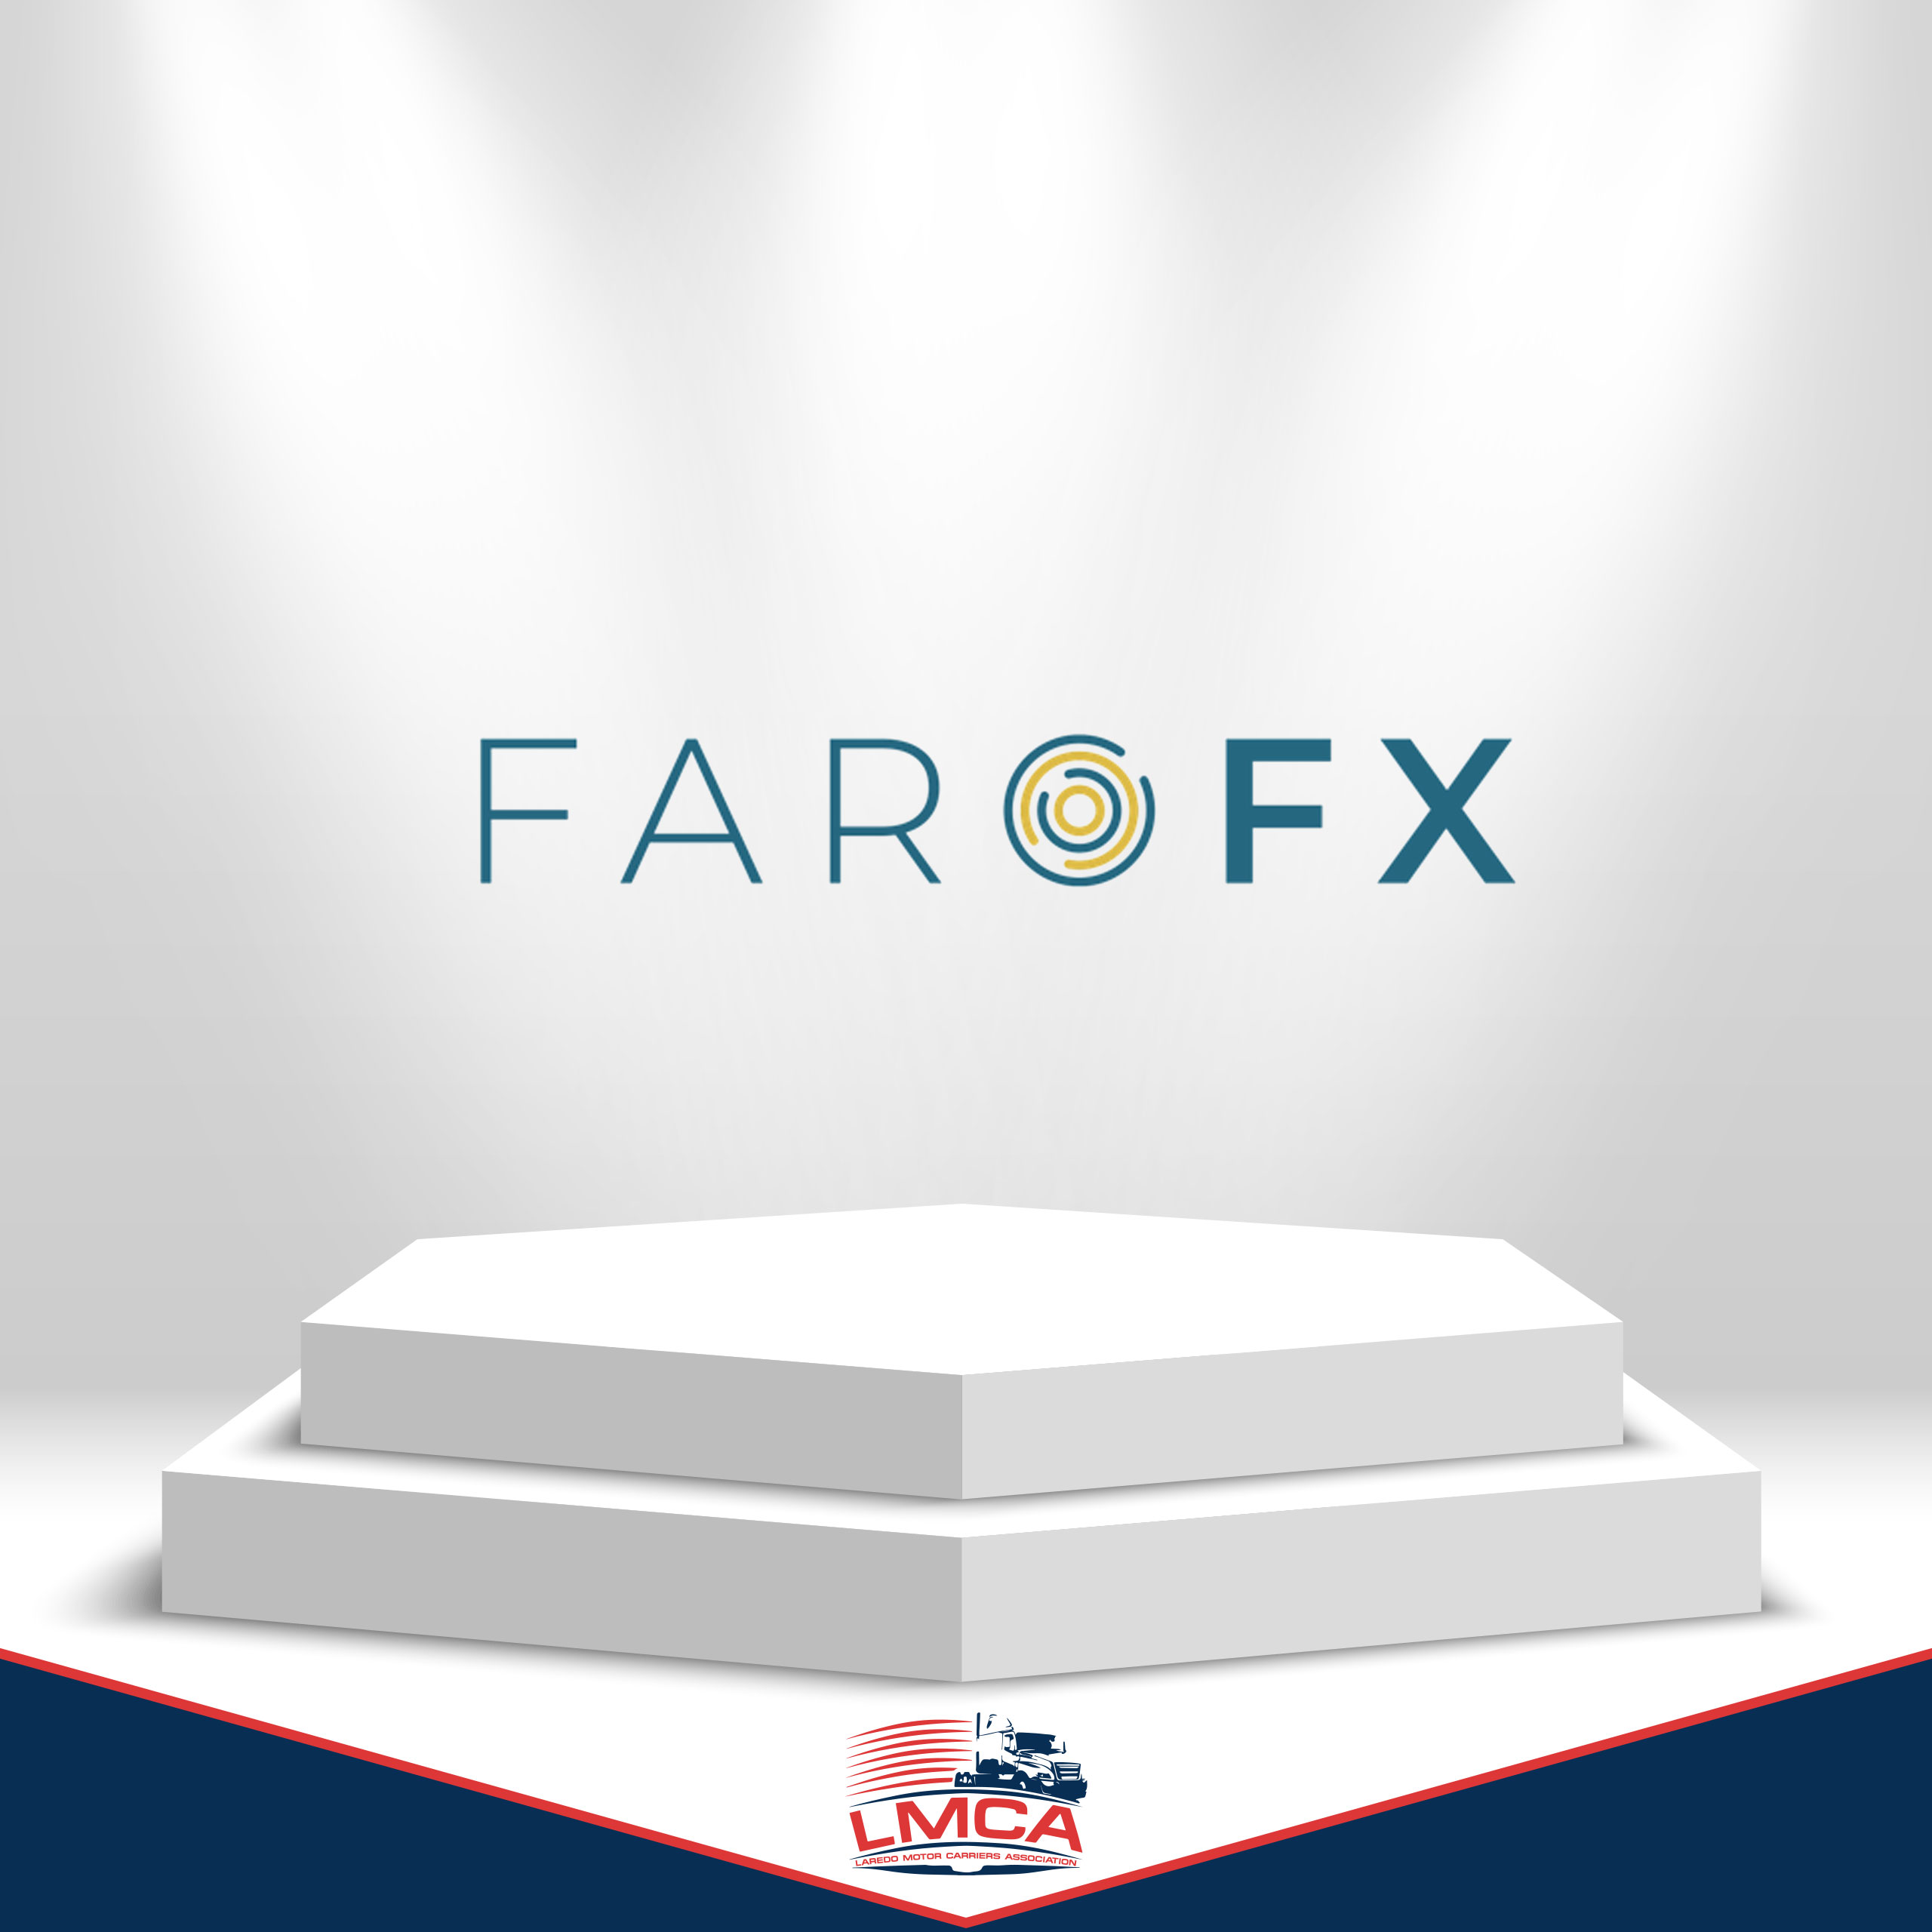 farofxlmca